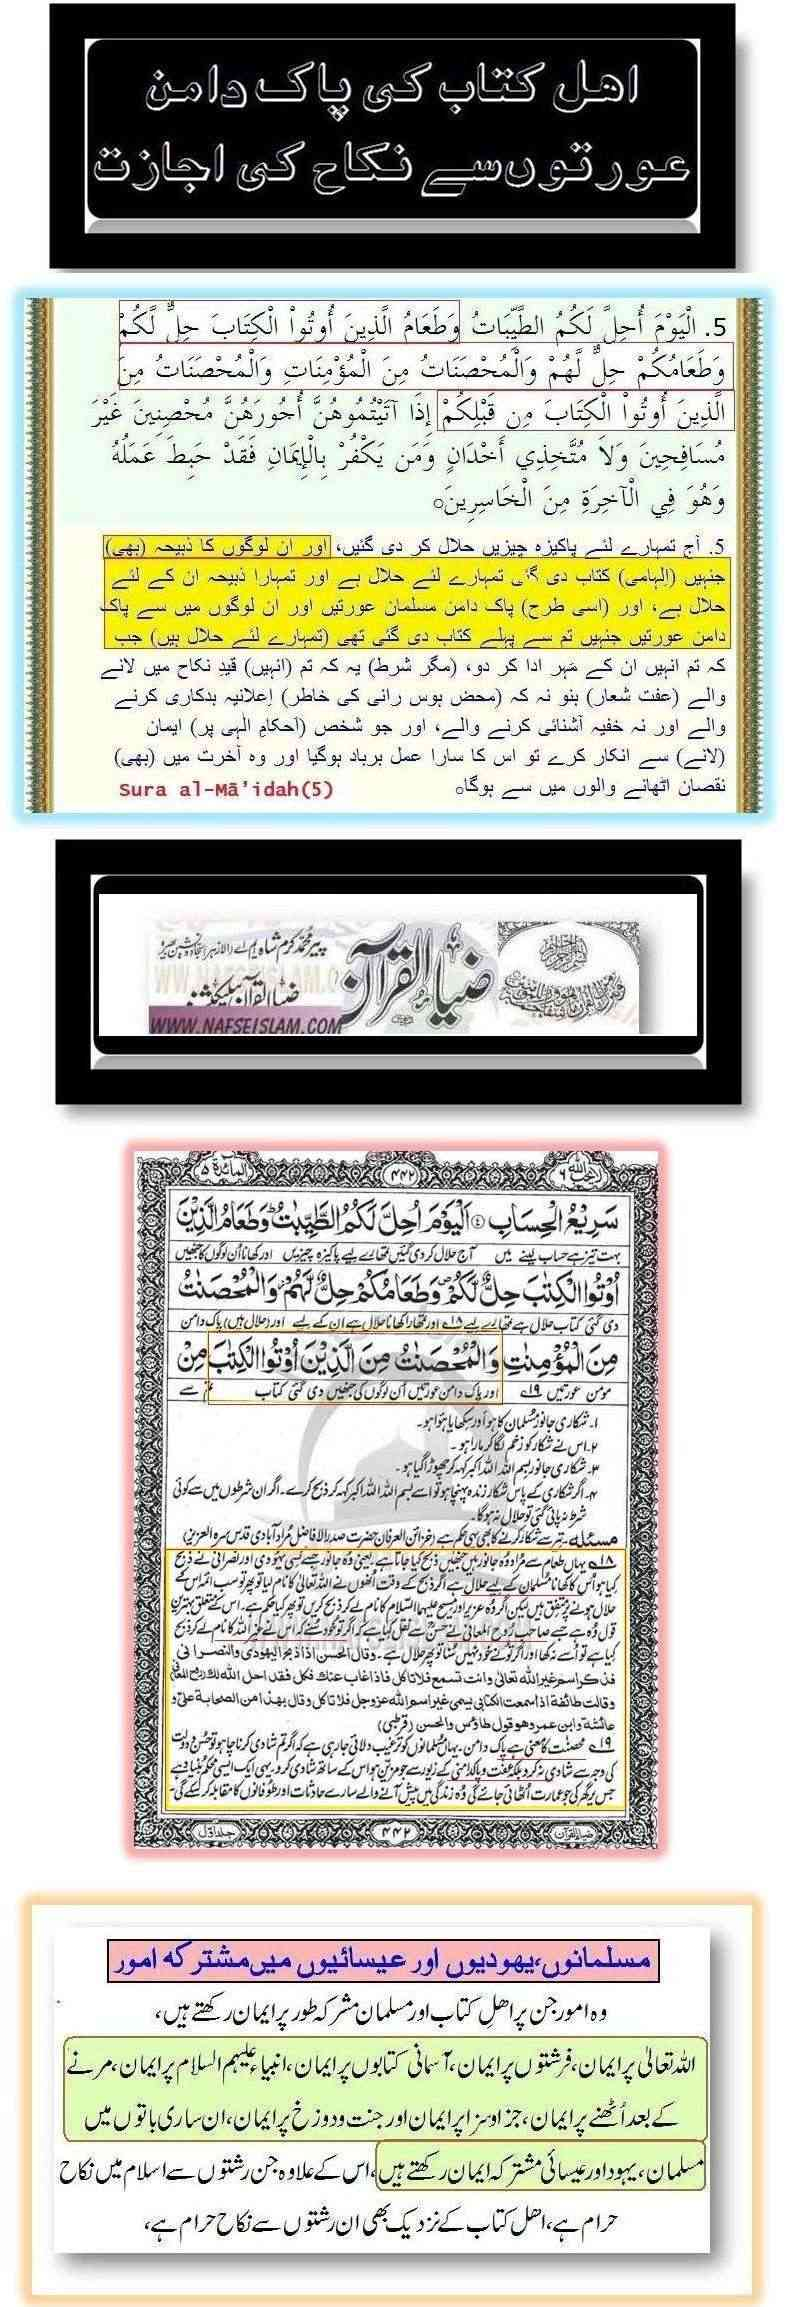 fazal fatwa Fatwa_13